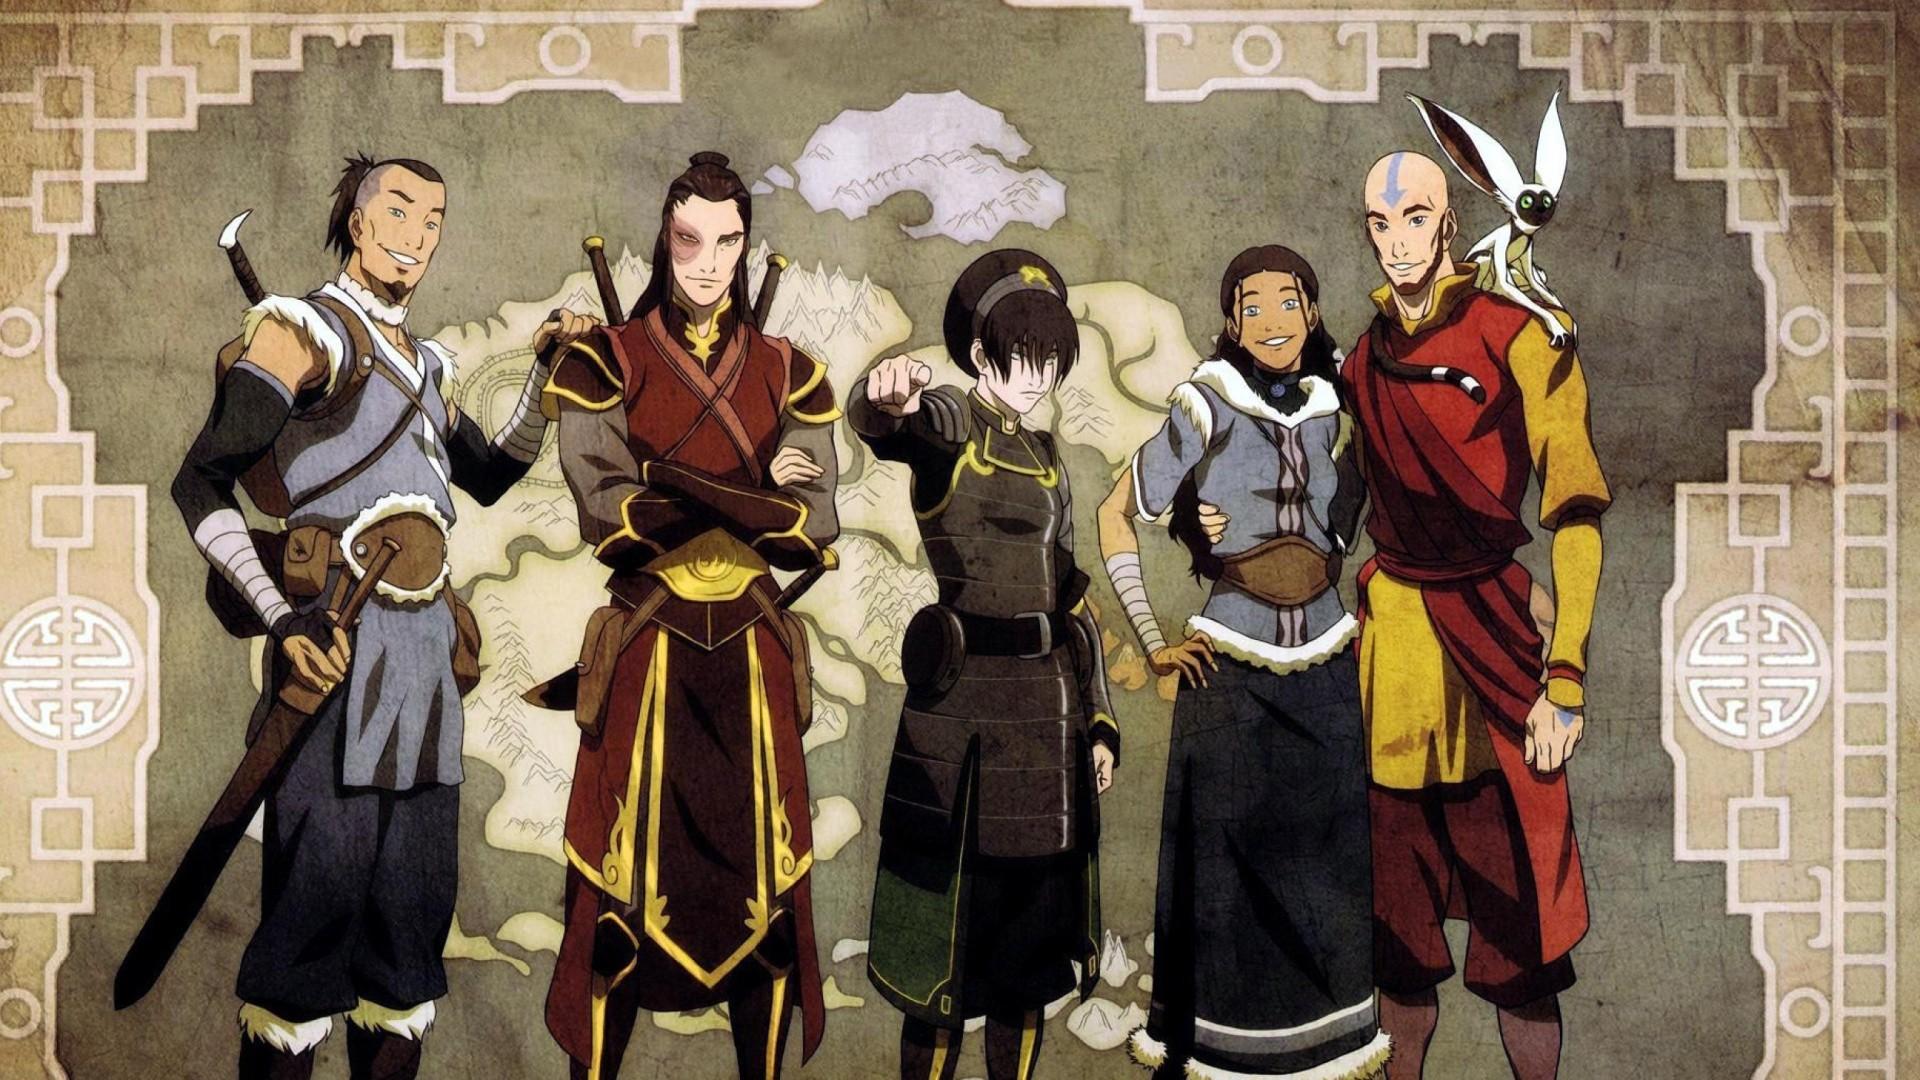 Avatar The Last Airbender hd wallpaper download